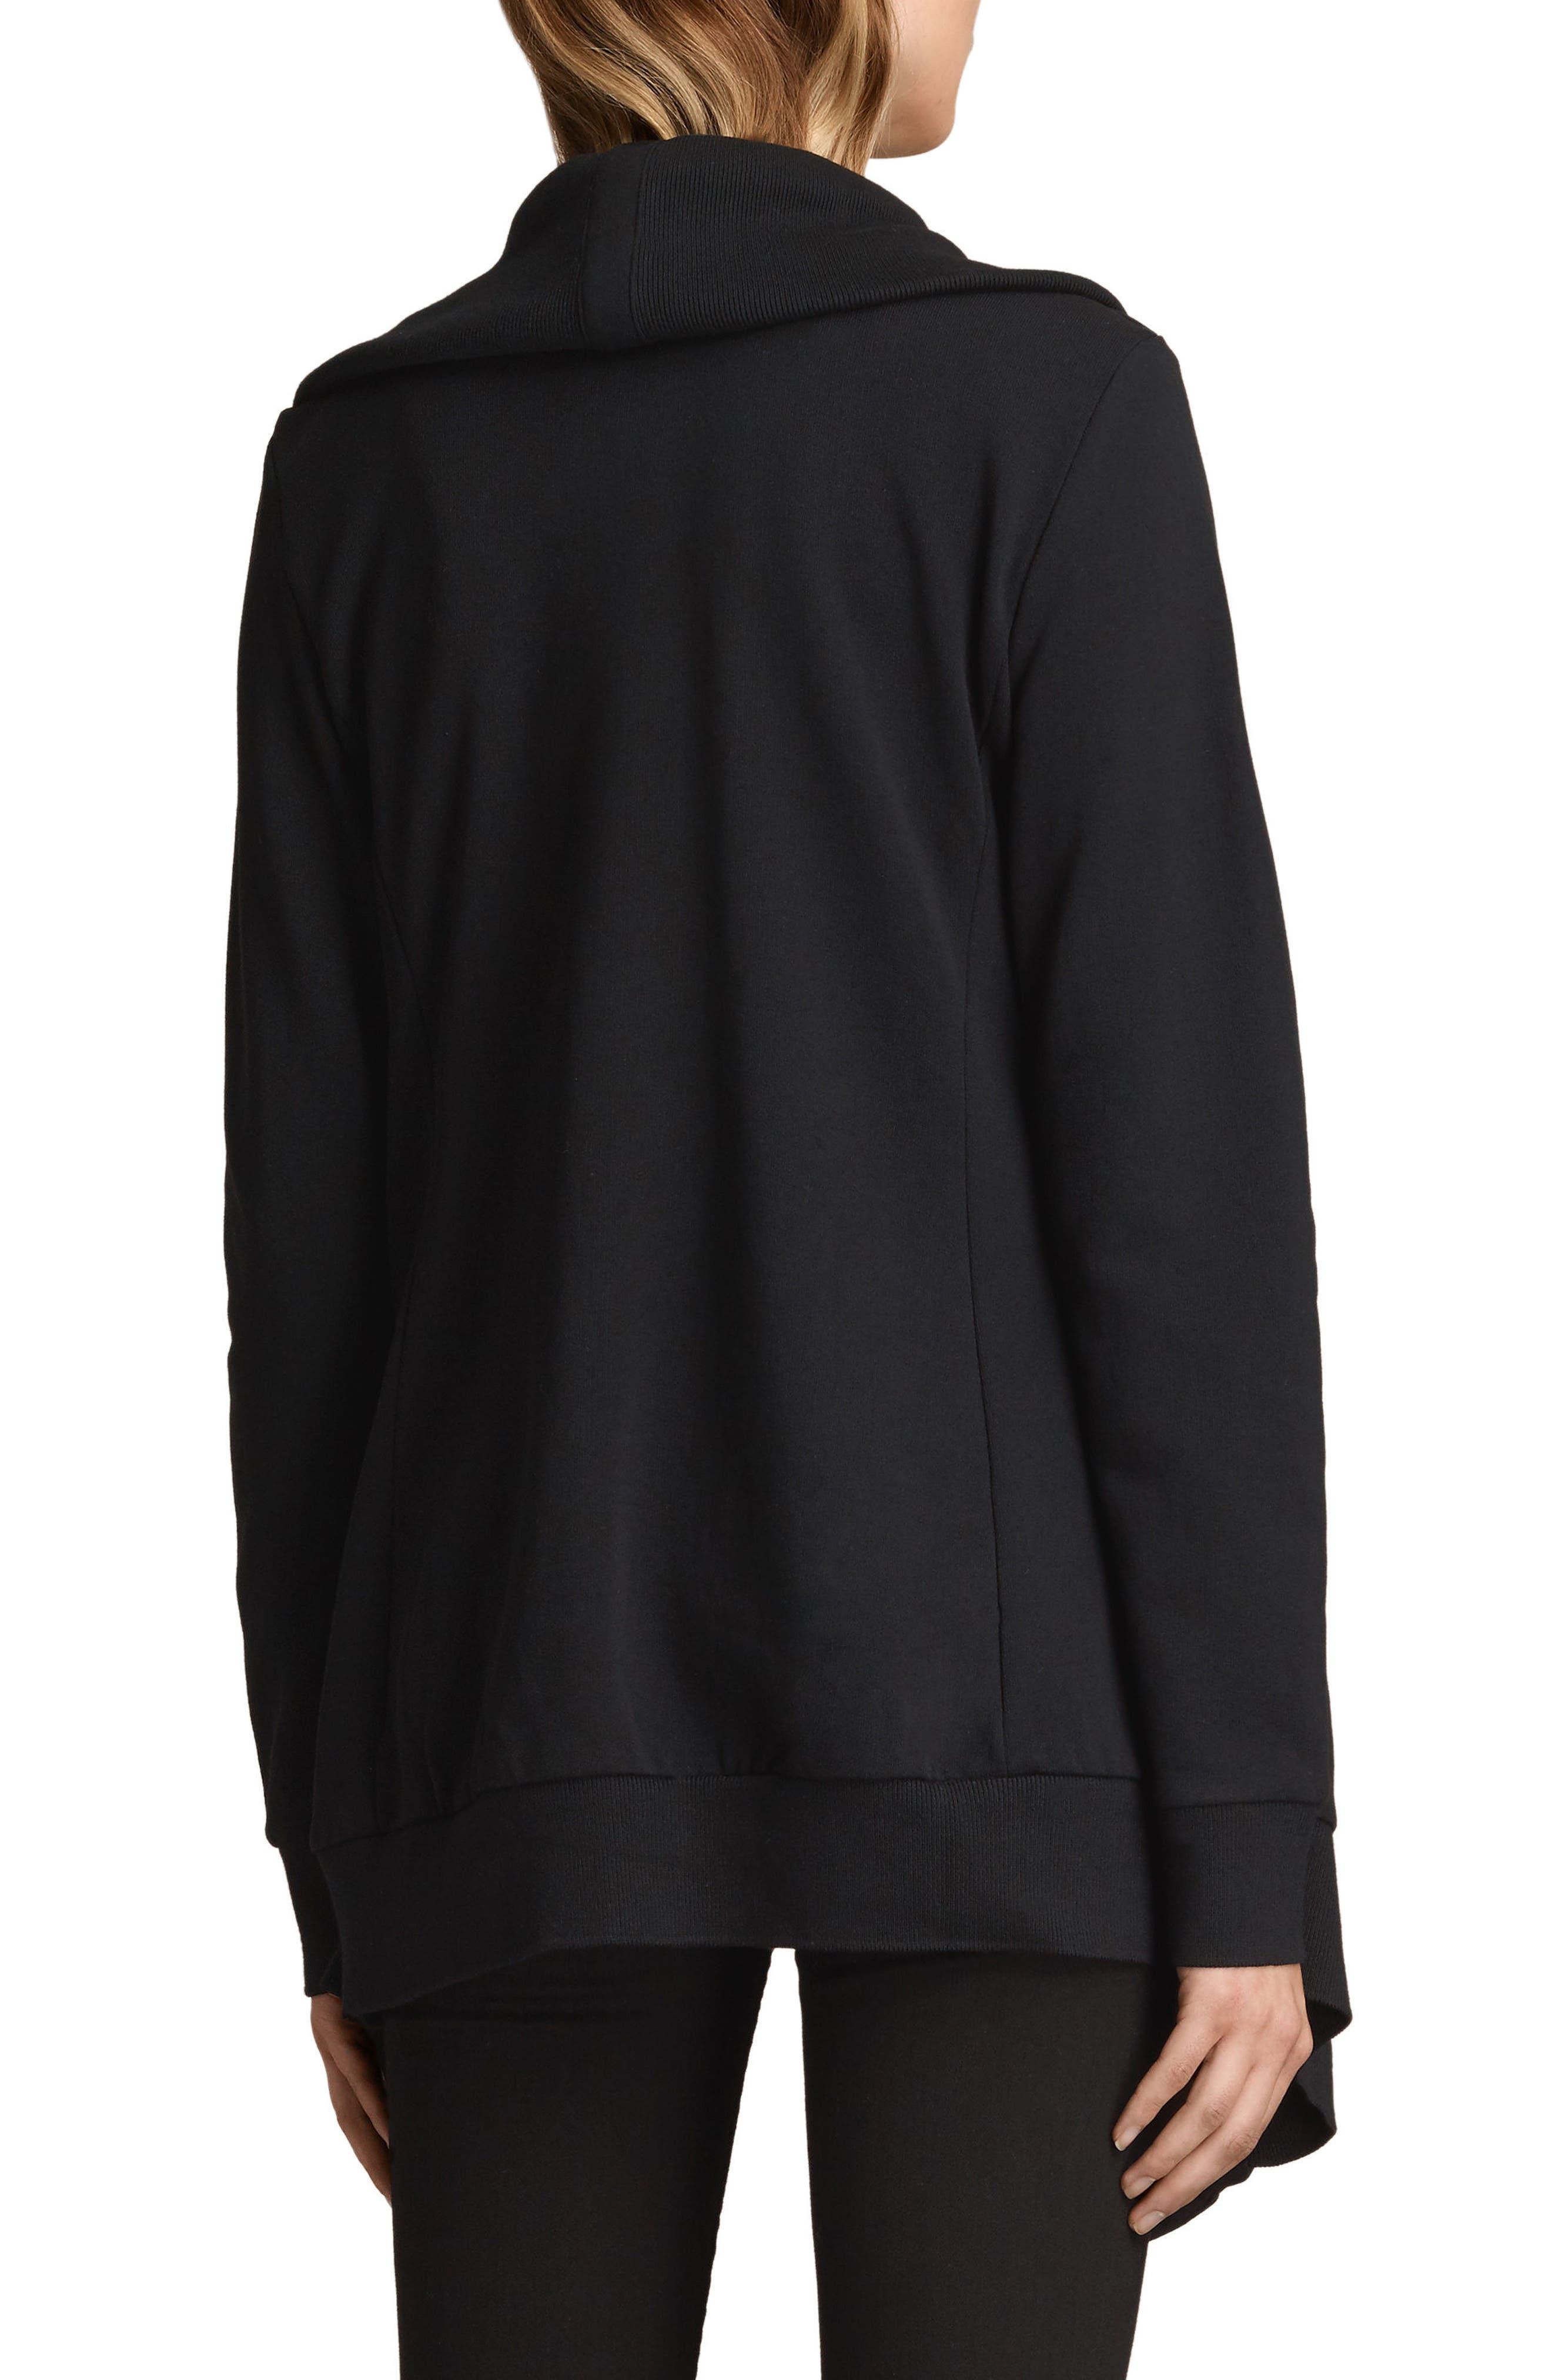 ALLSAINTS, Dahlia Sweatshirt, Alternate thumbnail 2, color, BLACK